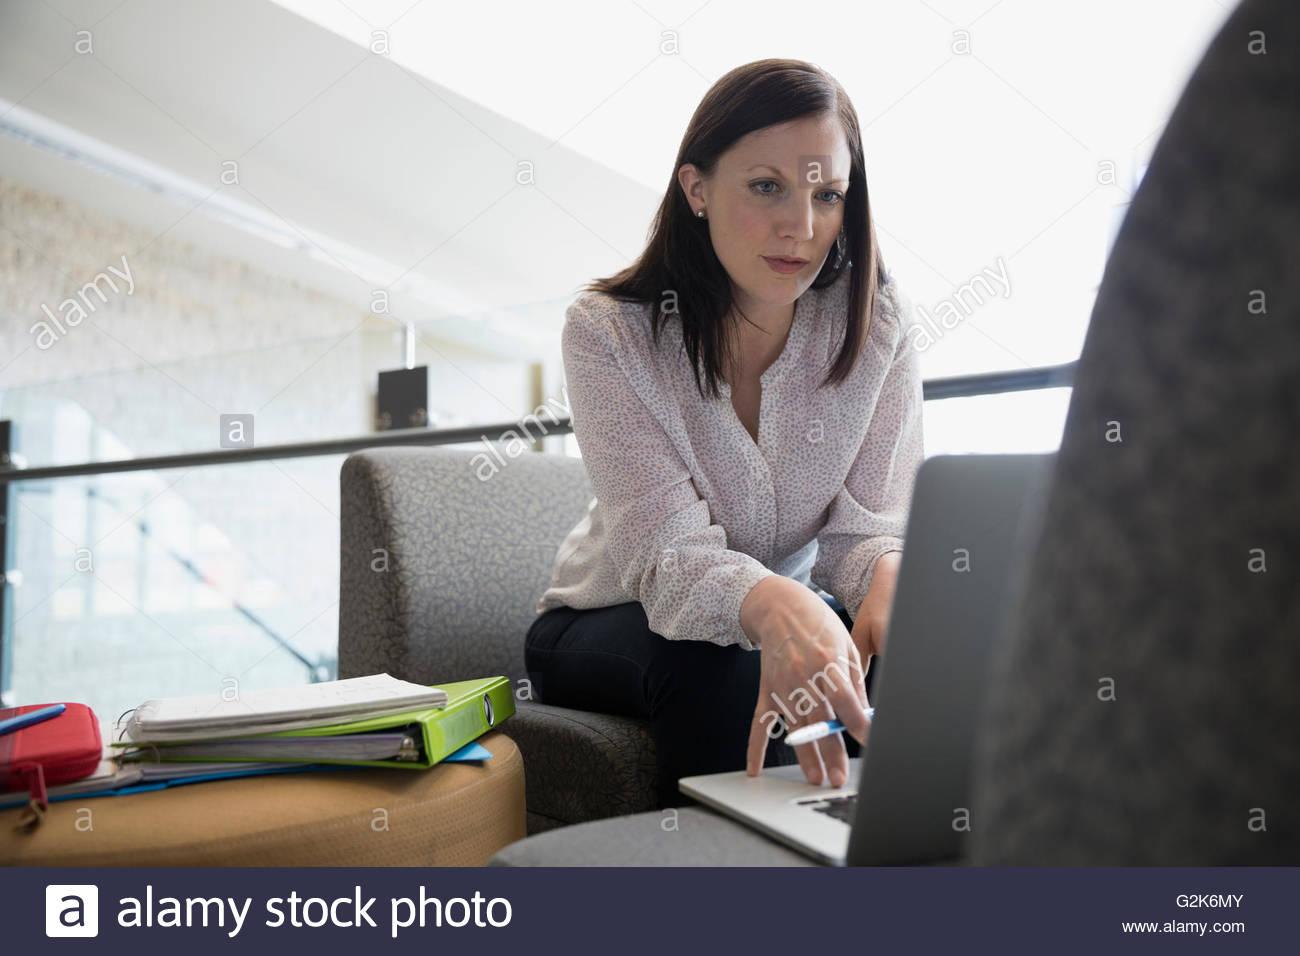 Adult education student using laptop - Stock Image